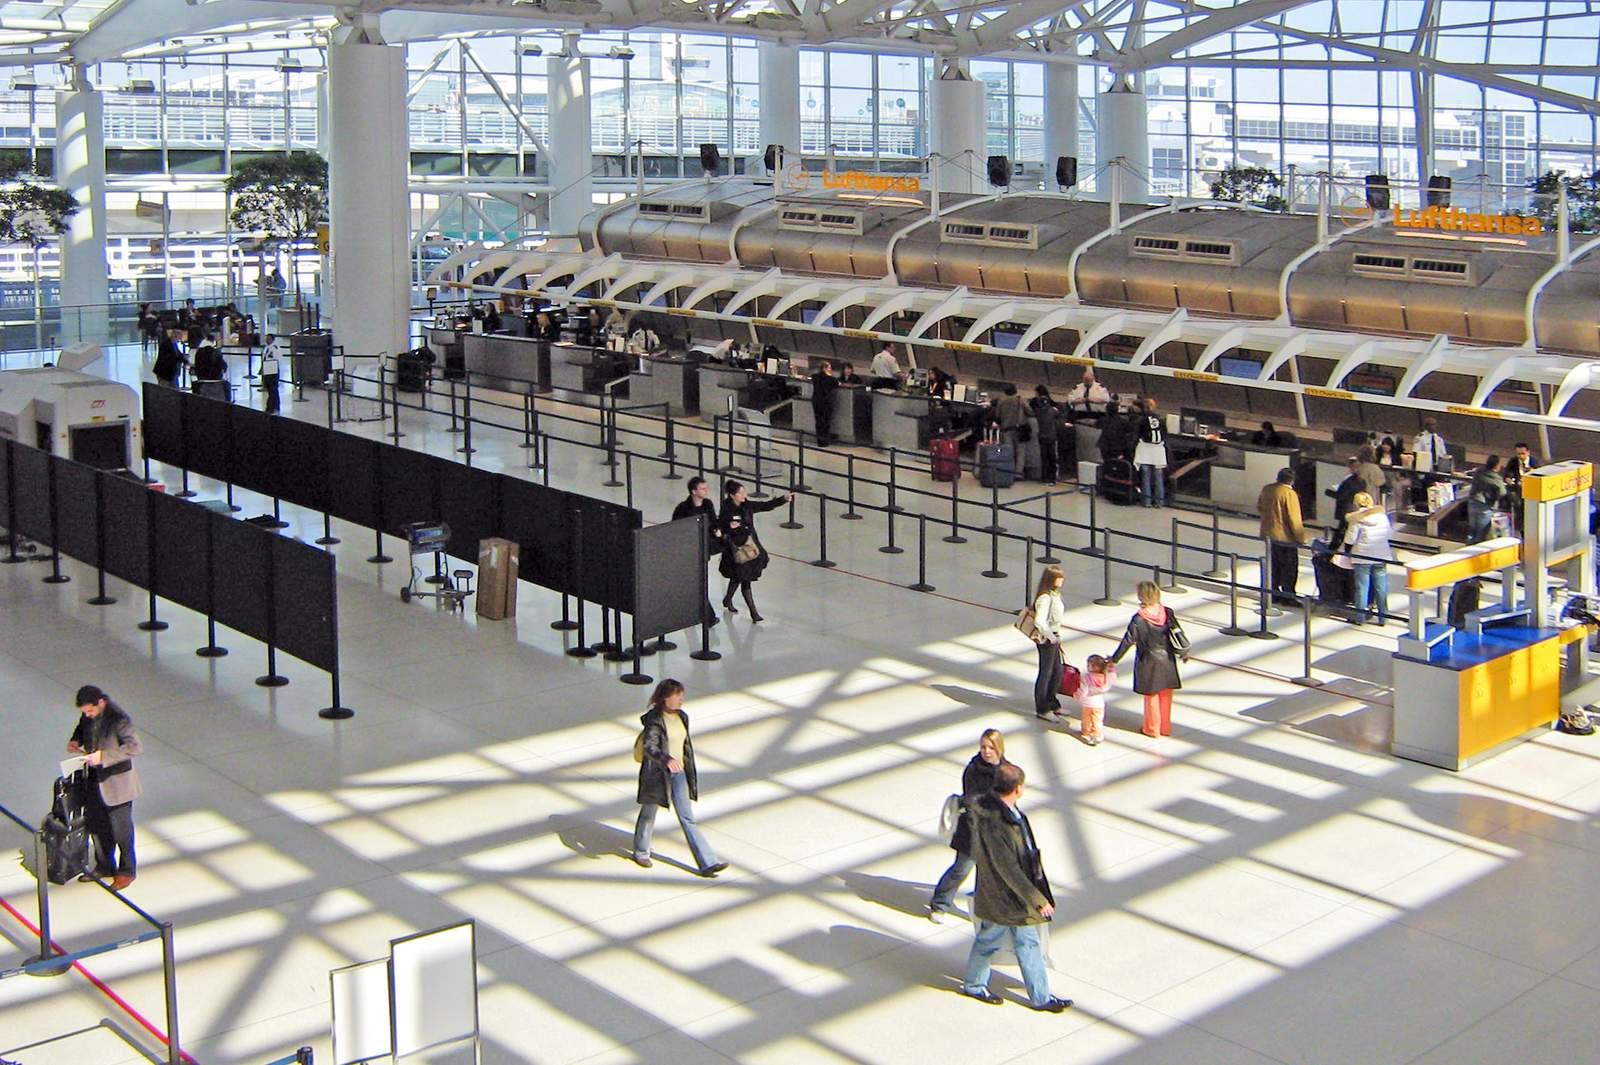 Impression Terminal 4 JFK Airport